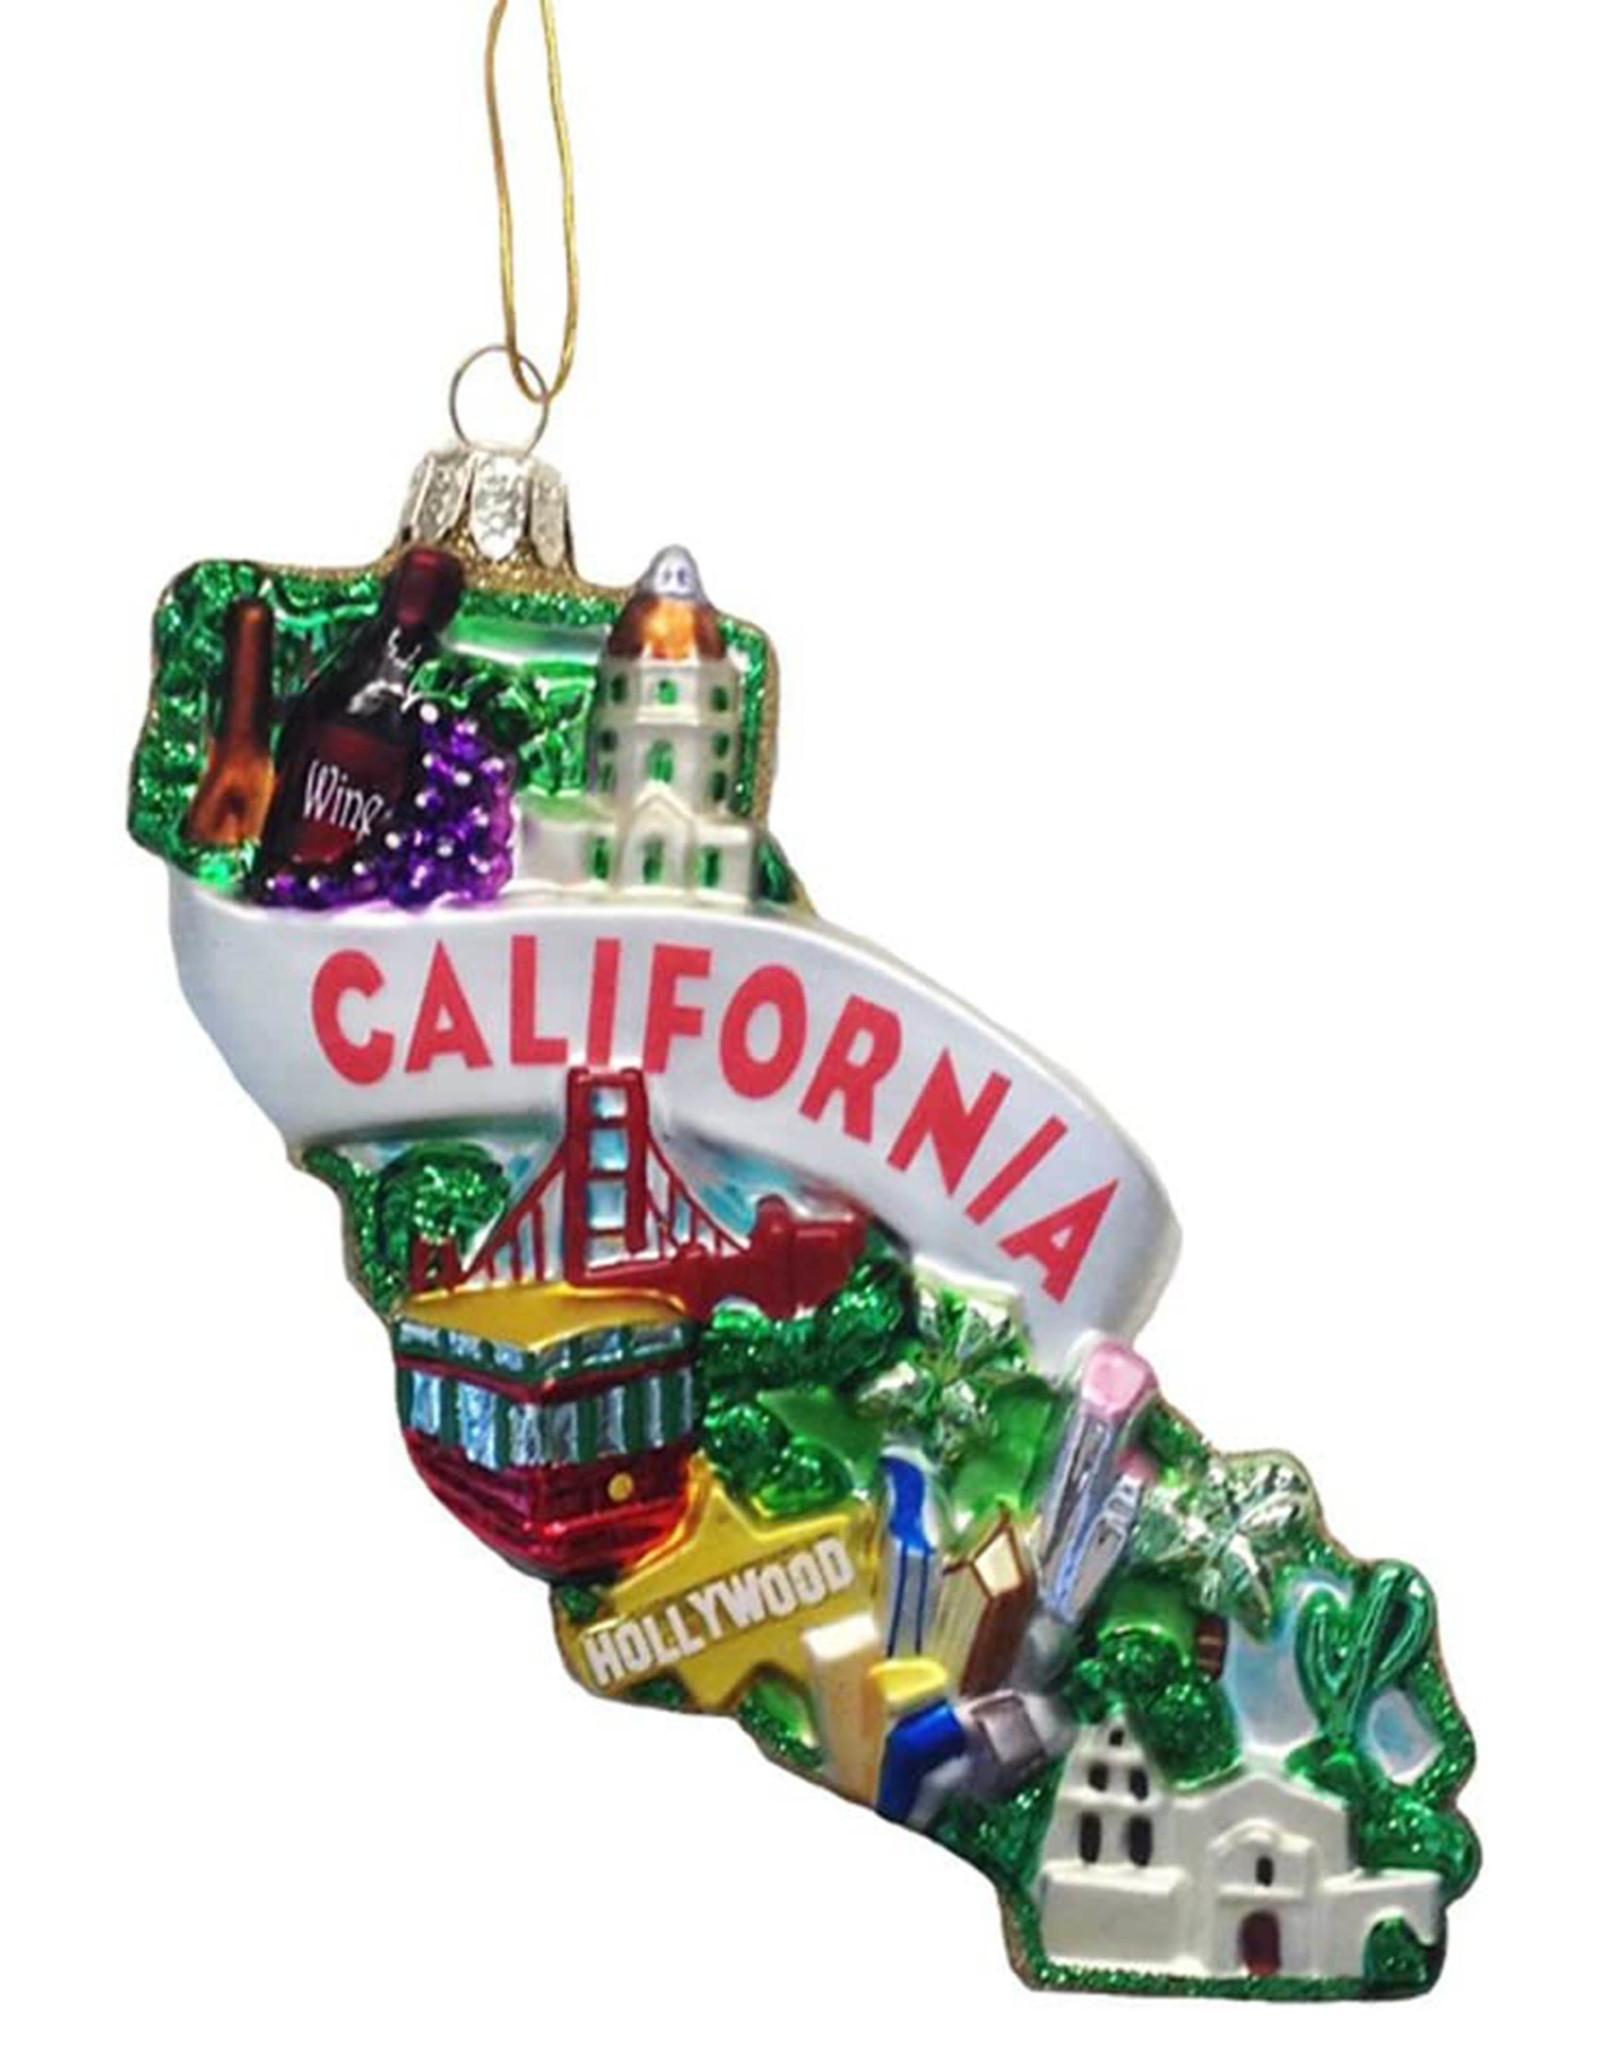 KURT ADLER CALIFORNIA ORNAMENT